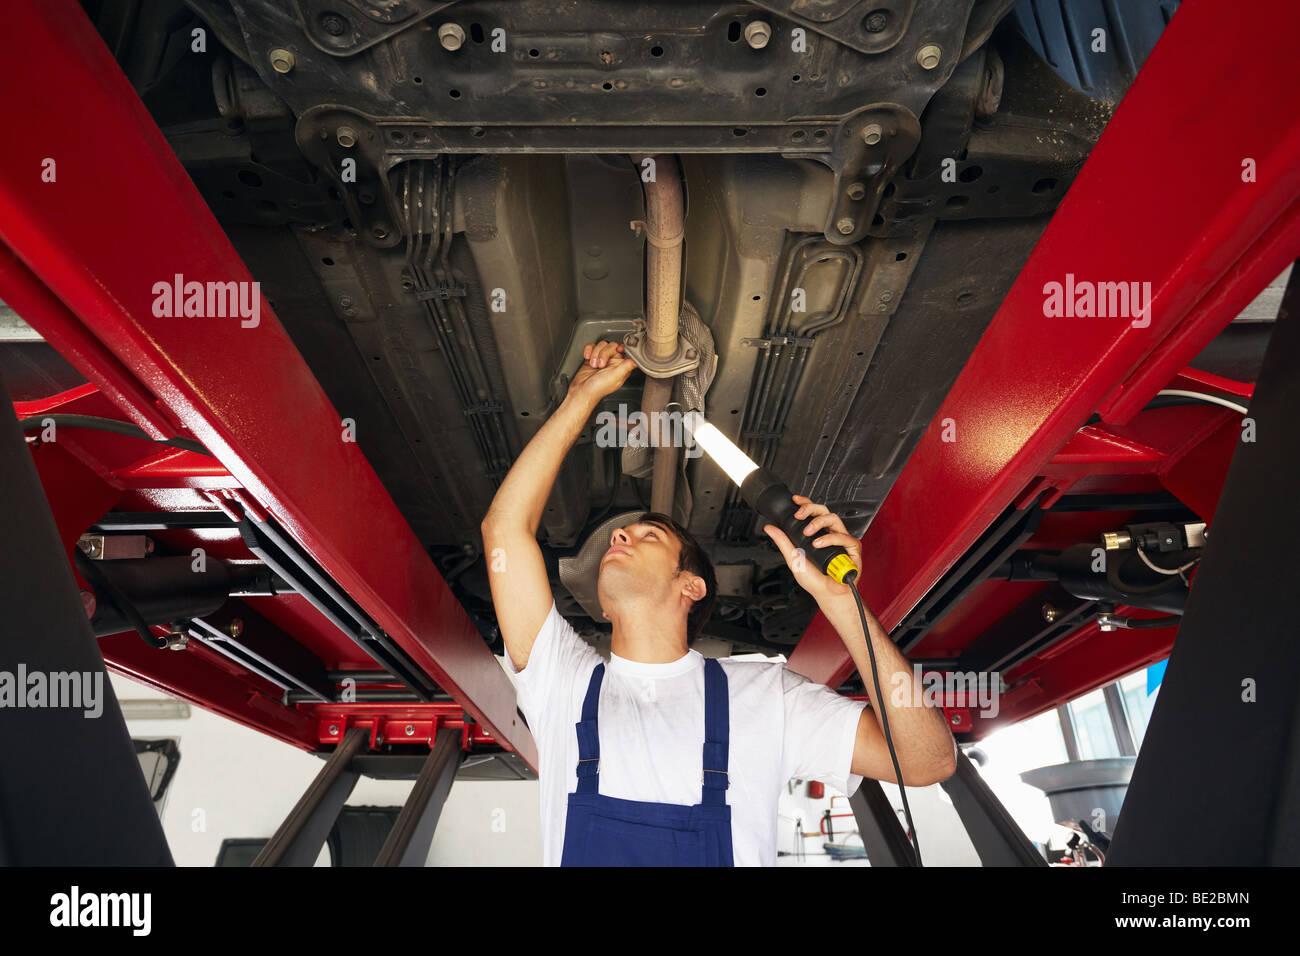 mechanic under car - Stock Image